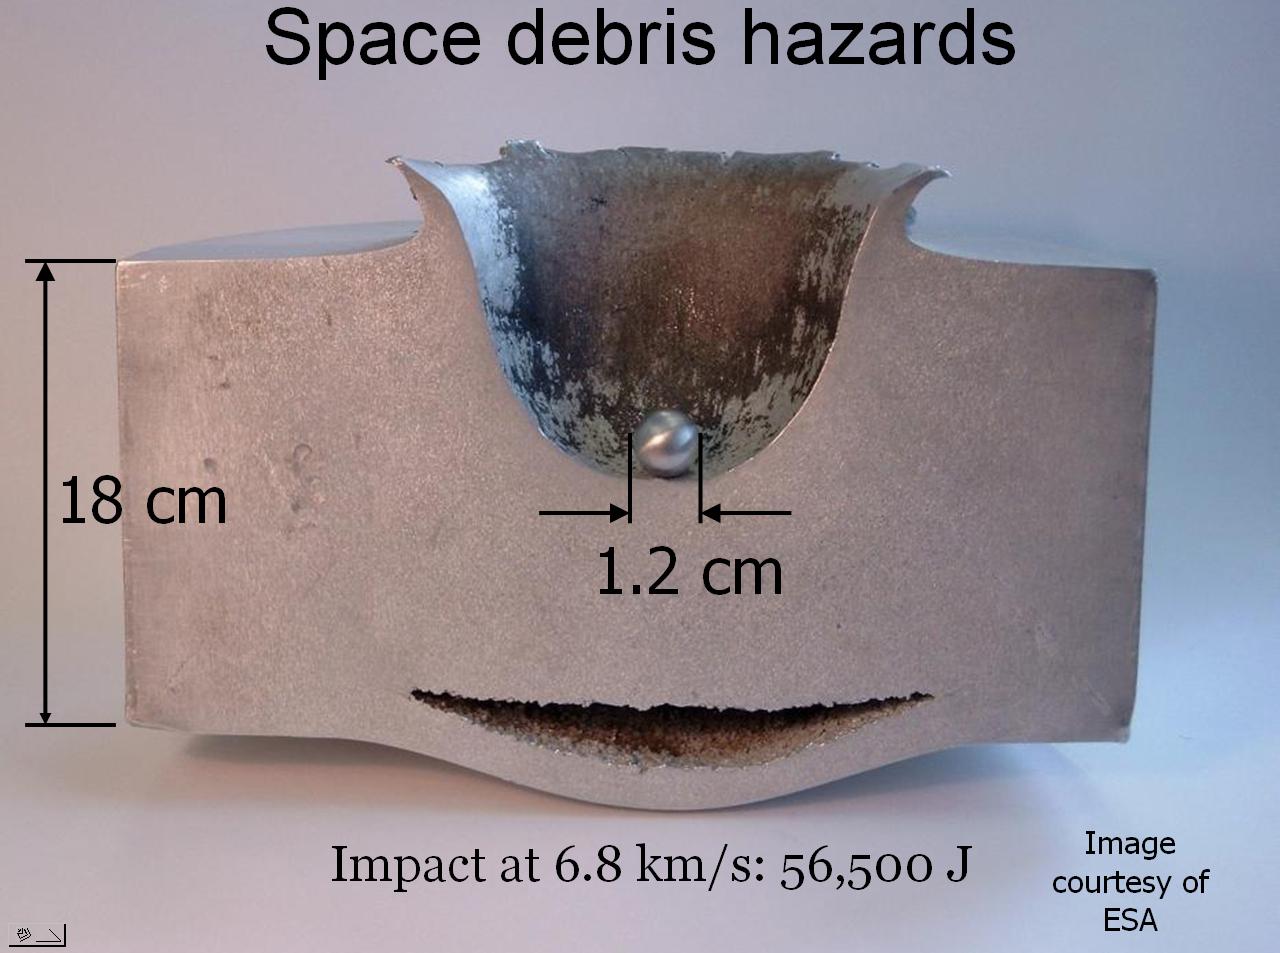 522539main knipp9 debris 宇宙ゴミ問題が深刻に。